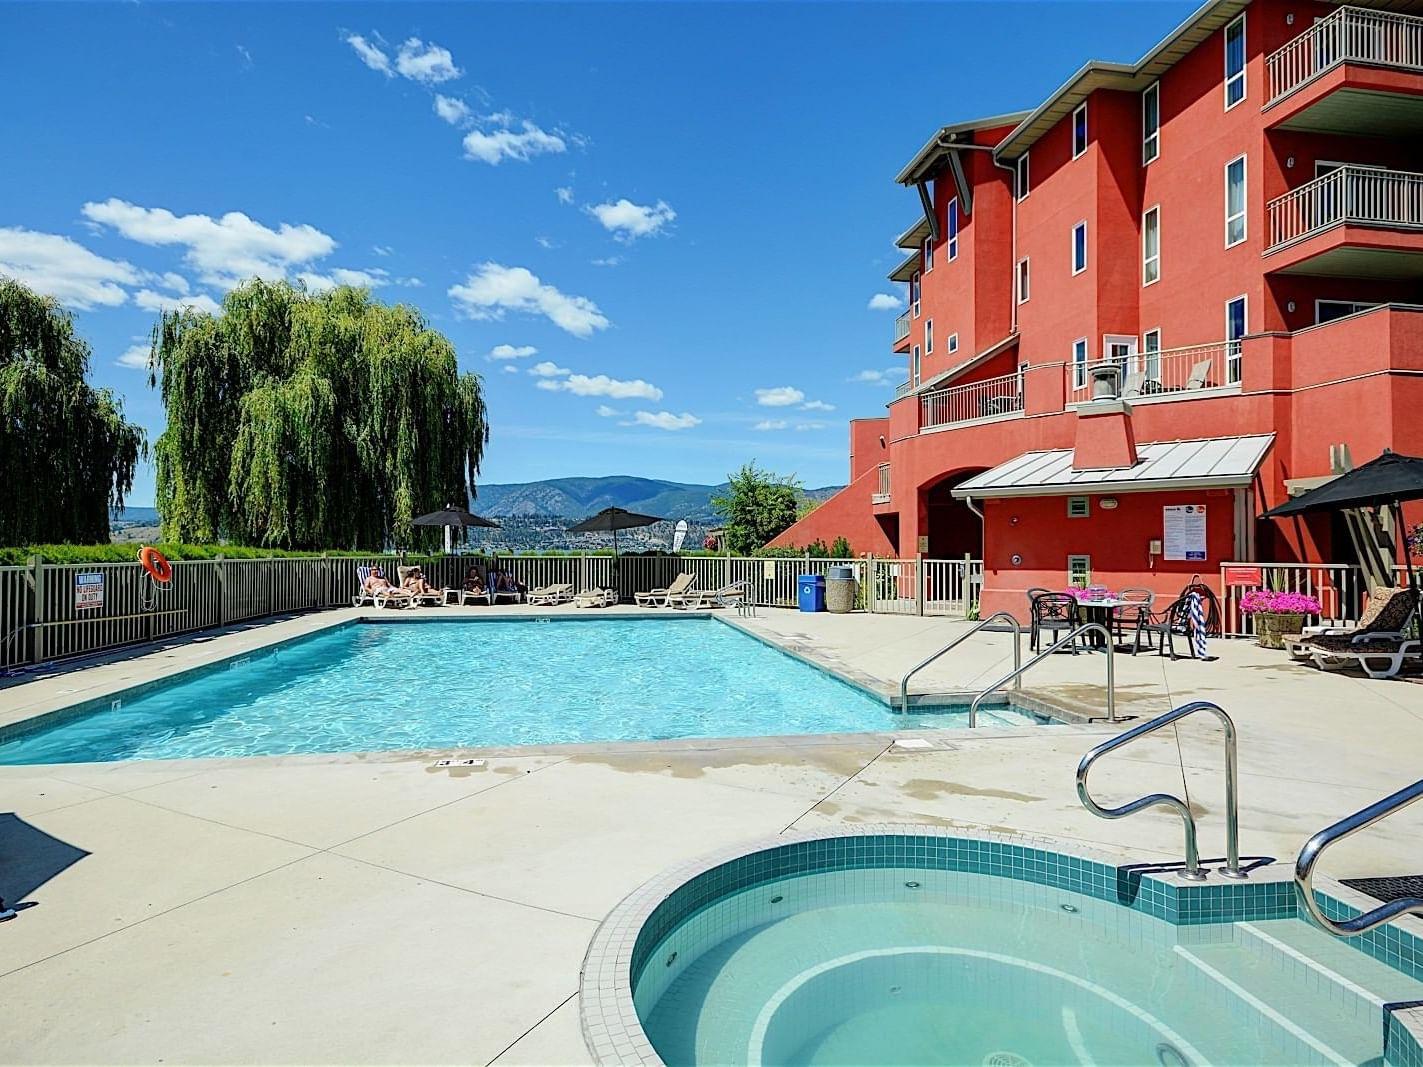 Pool area at Manteo Resort